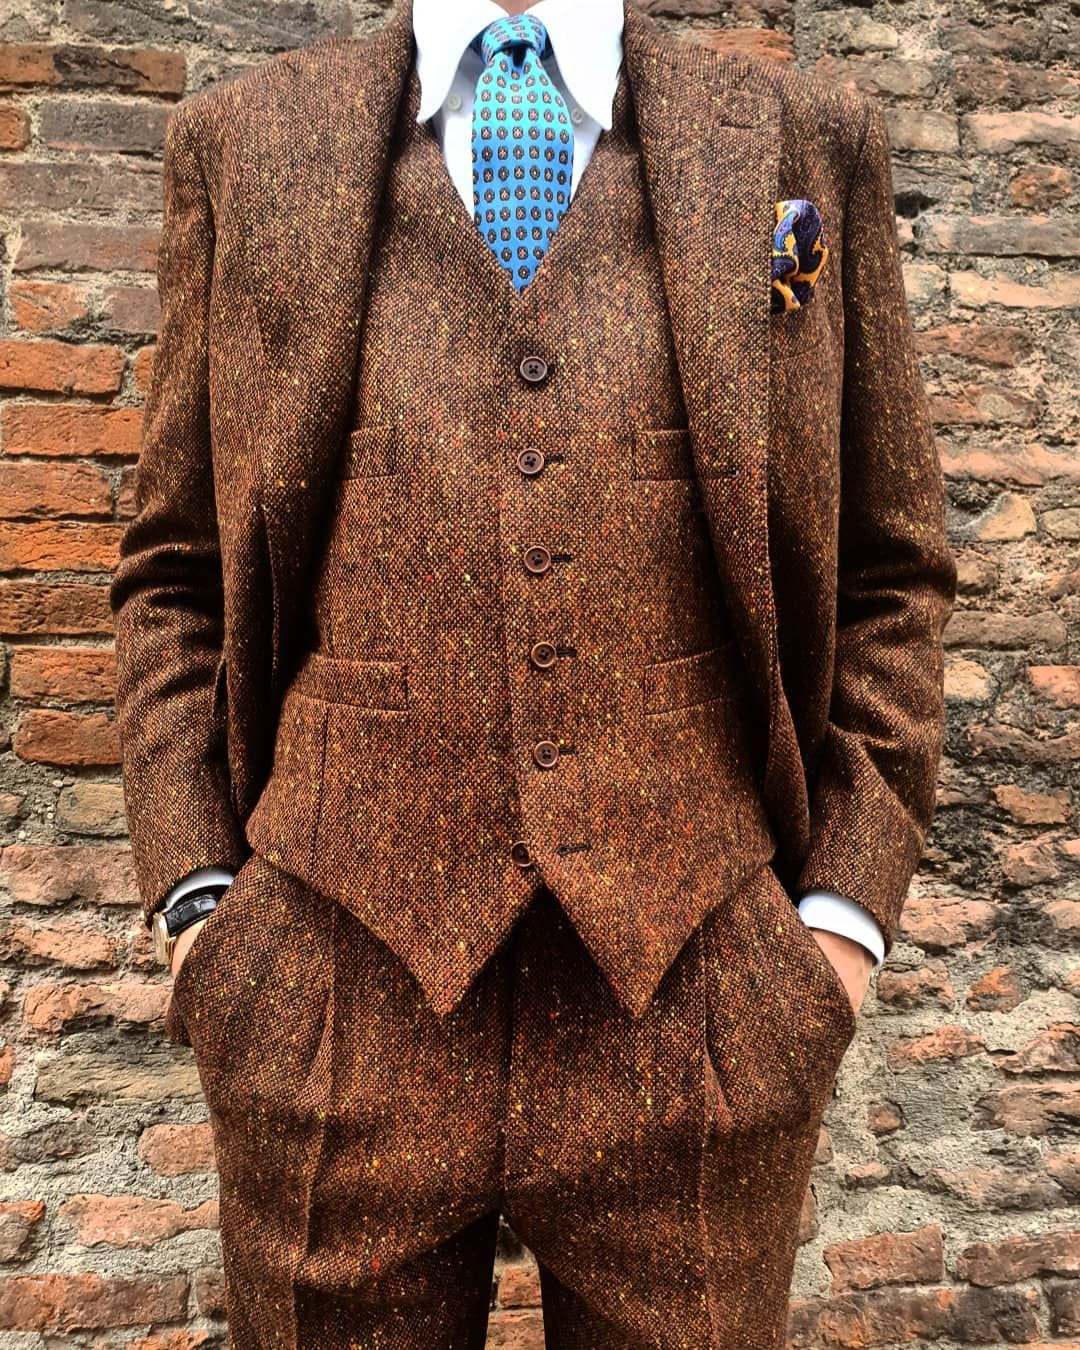 New Arrivals Irish Donegal Tweed Depaz Depazshop Depazstyle Newarrival Suit Britishgentleman Menwith Vintage Suit Men Fall Outfits Men Mens Tweed Suit